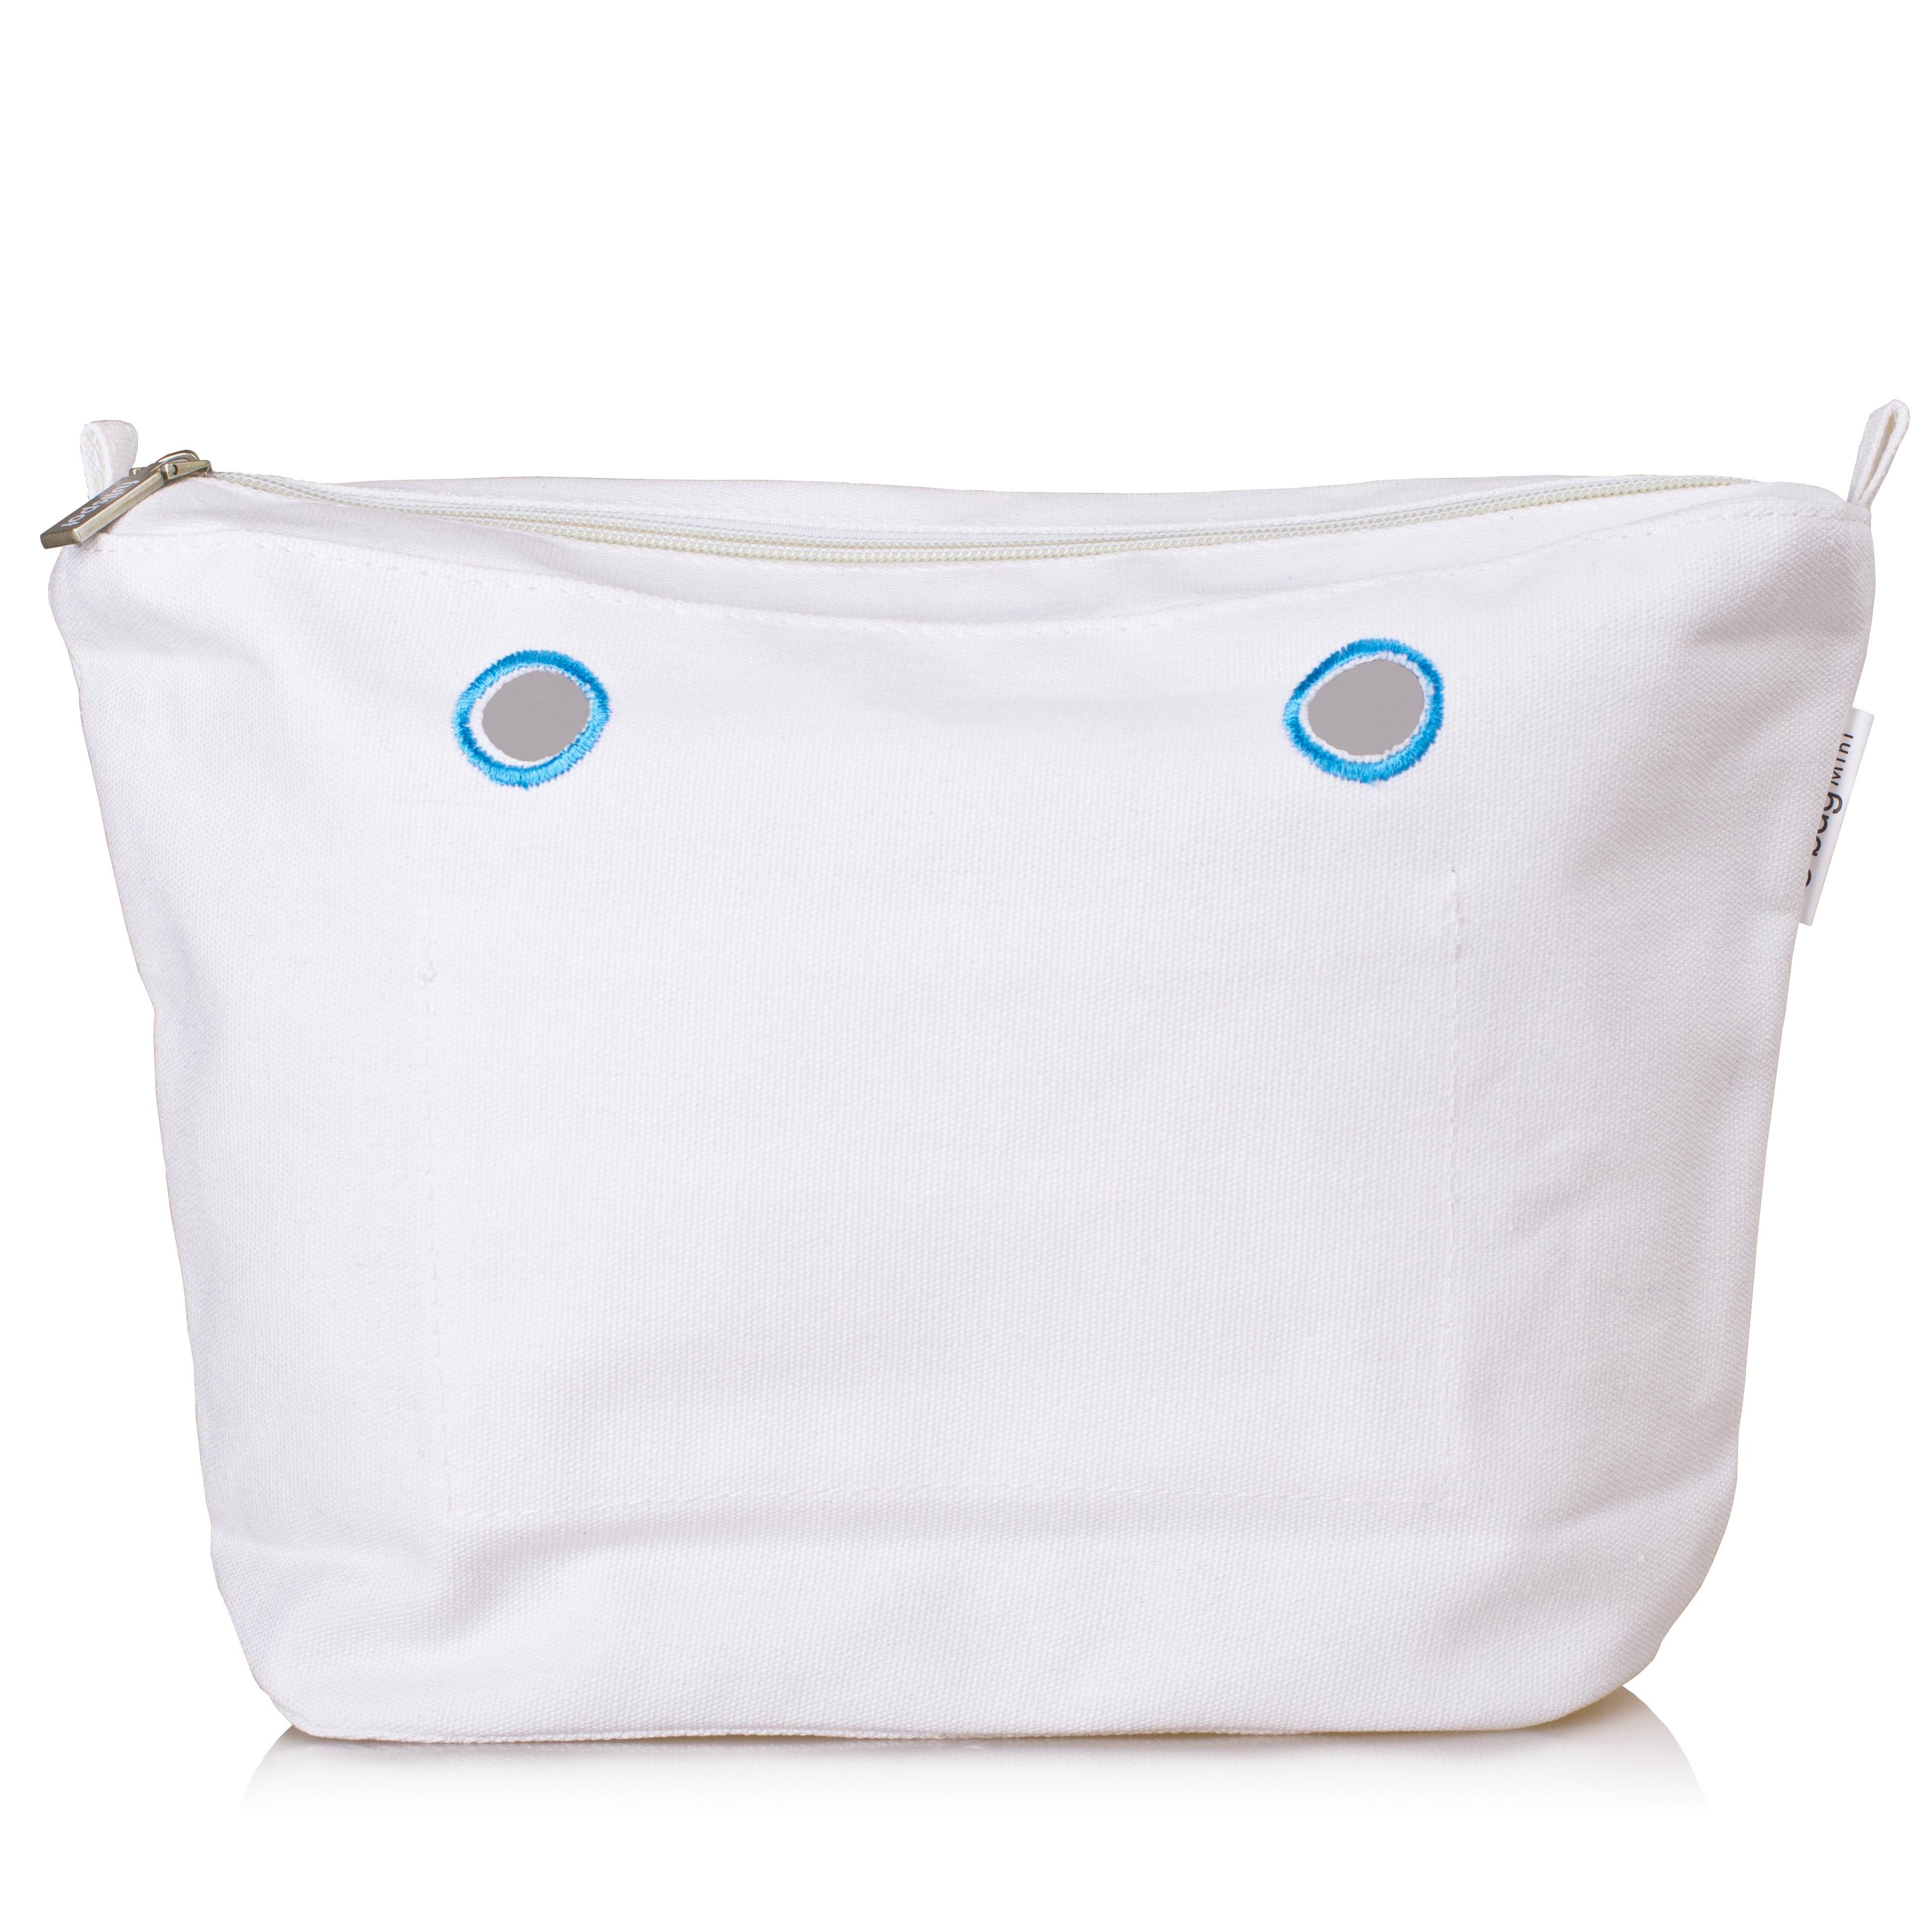 O bag belsô táska fehér Mini - Glami.hu 682a90eb15